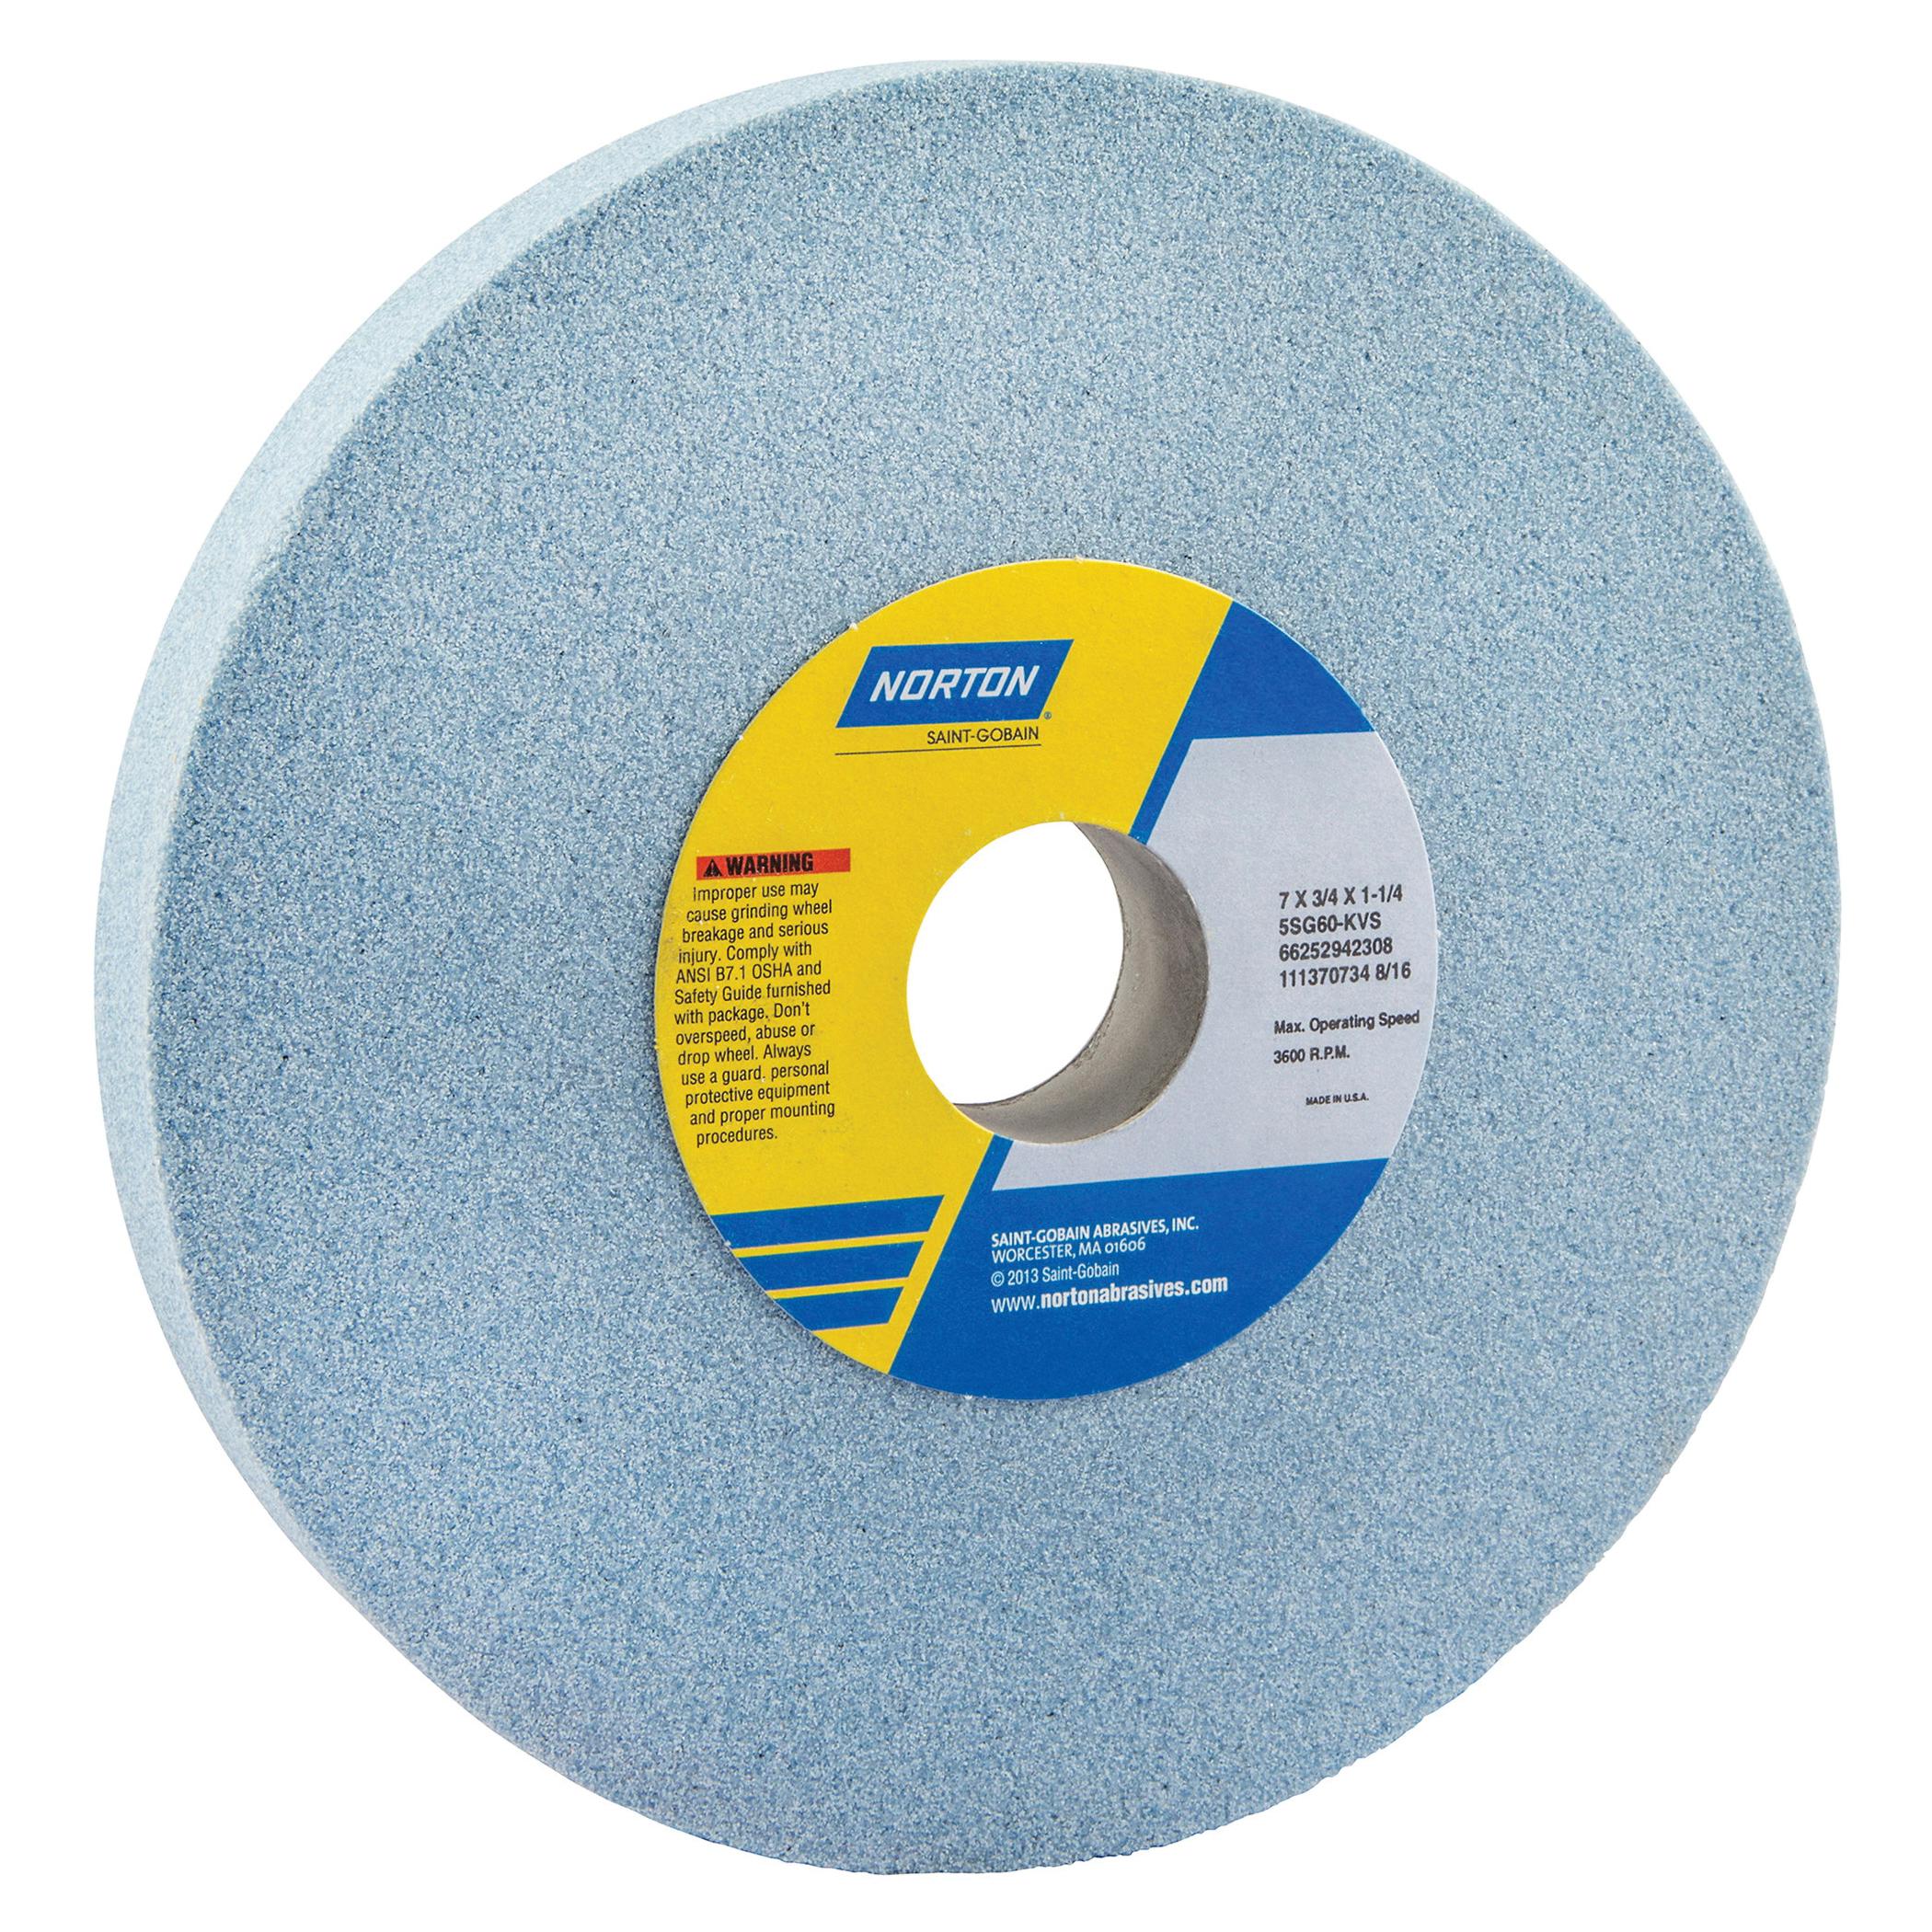 Norton® 66252942308 5SG Straight Toolroom Wheel, 7 in Dia x 3/4 in THK, 1-1/4 in Center Hole, 60 Grit, Ceramic Alumina/Friable Aluminum Oxide Abrasive